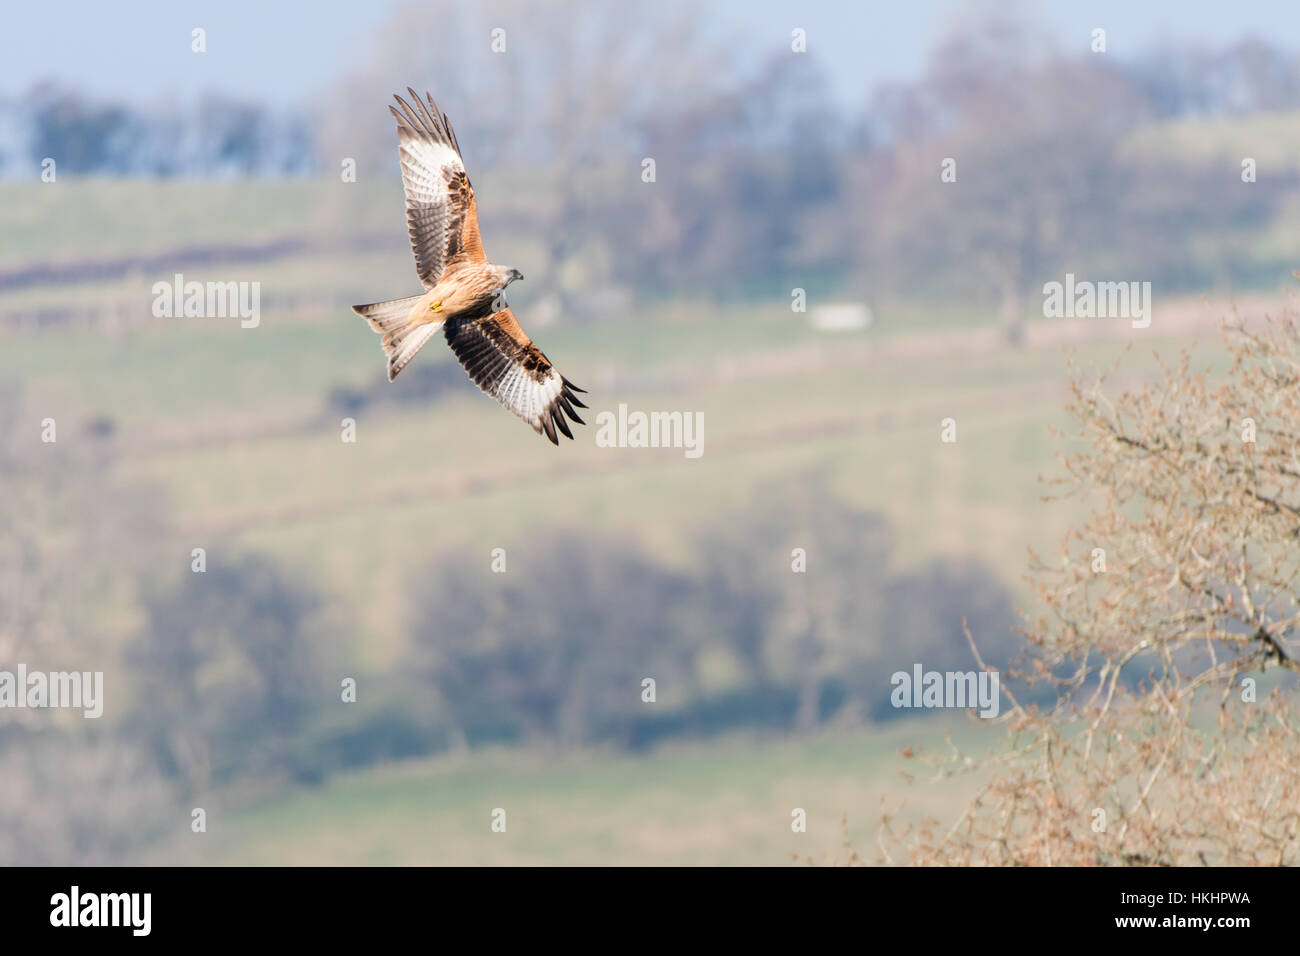 Red kite (Milvus milvus) banking in flight with underside. Medium-large bird of prey in family Accipitridae, in - Stock Image